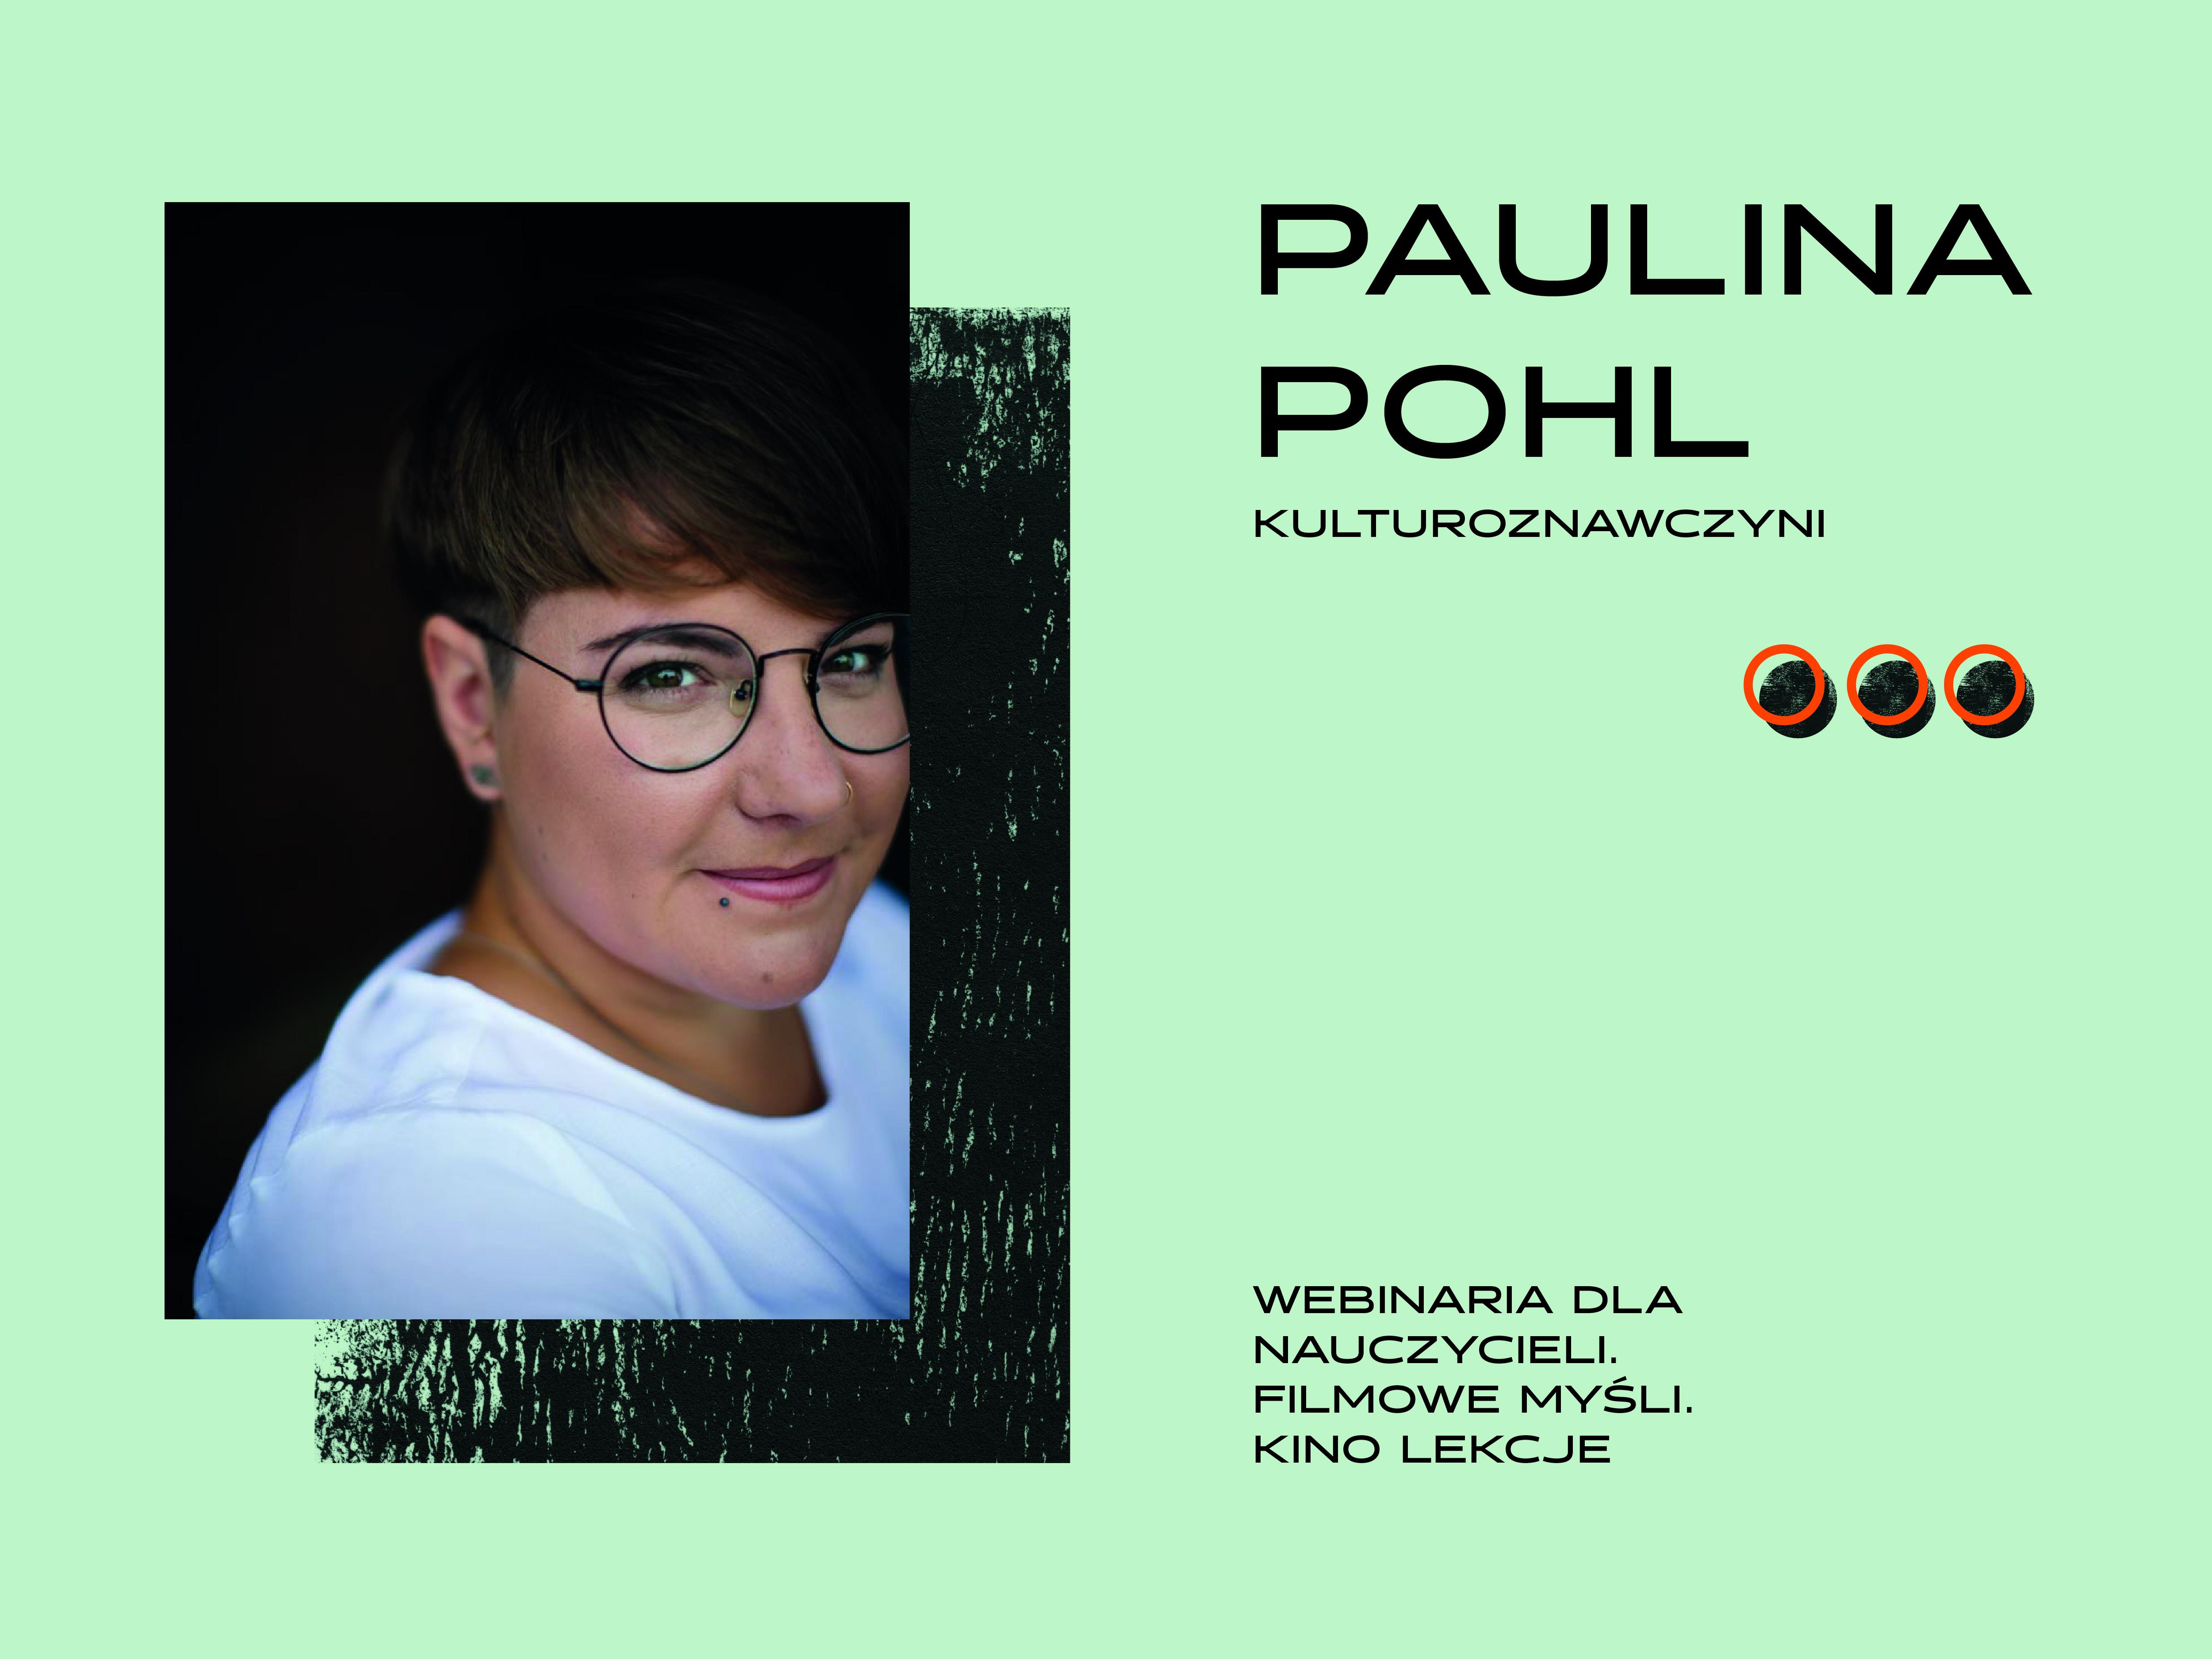 Portret Pauliny Pohl, mat. PFF